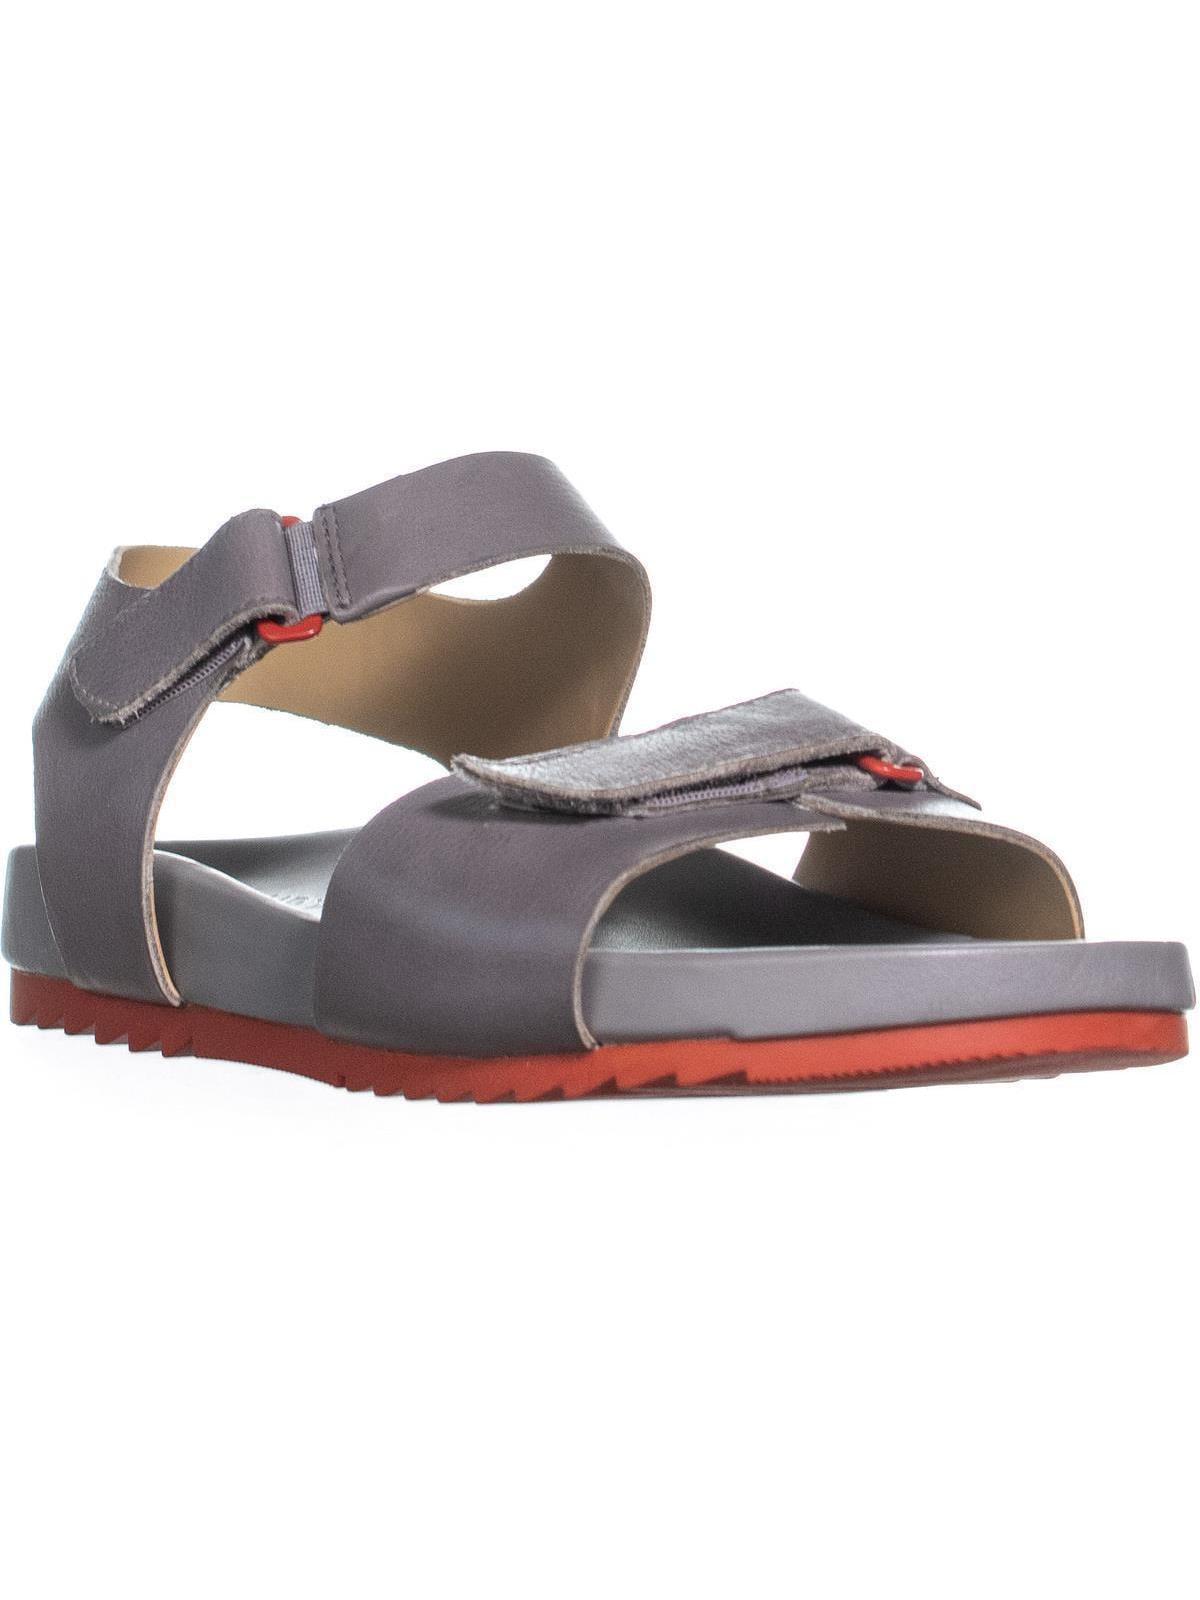 Womens Naturalizer Ari Strap Sport Sandals, Grey Fog by Naturalizer